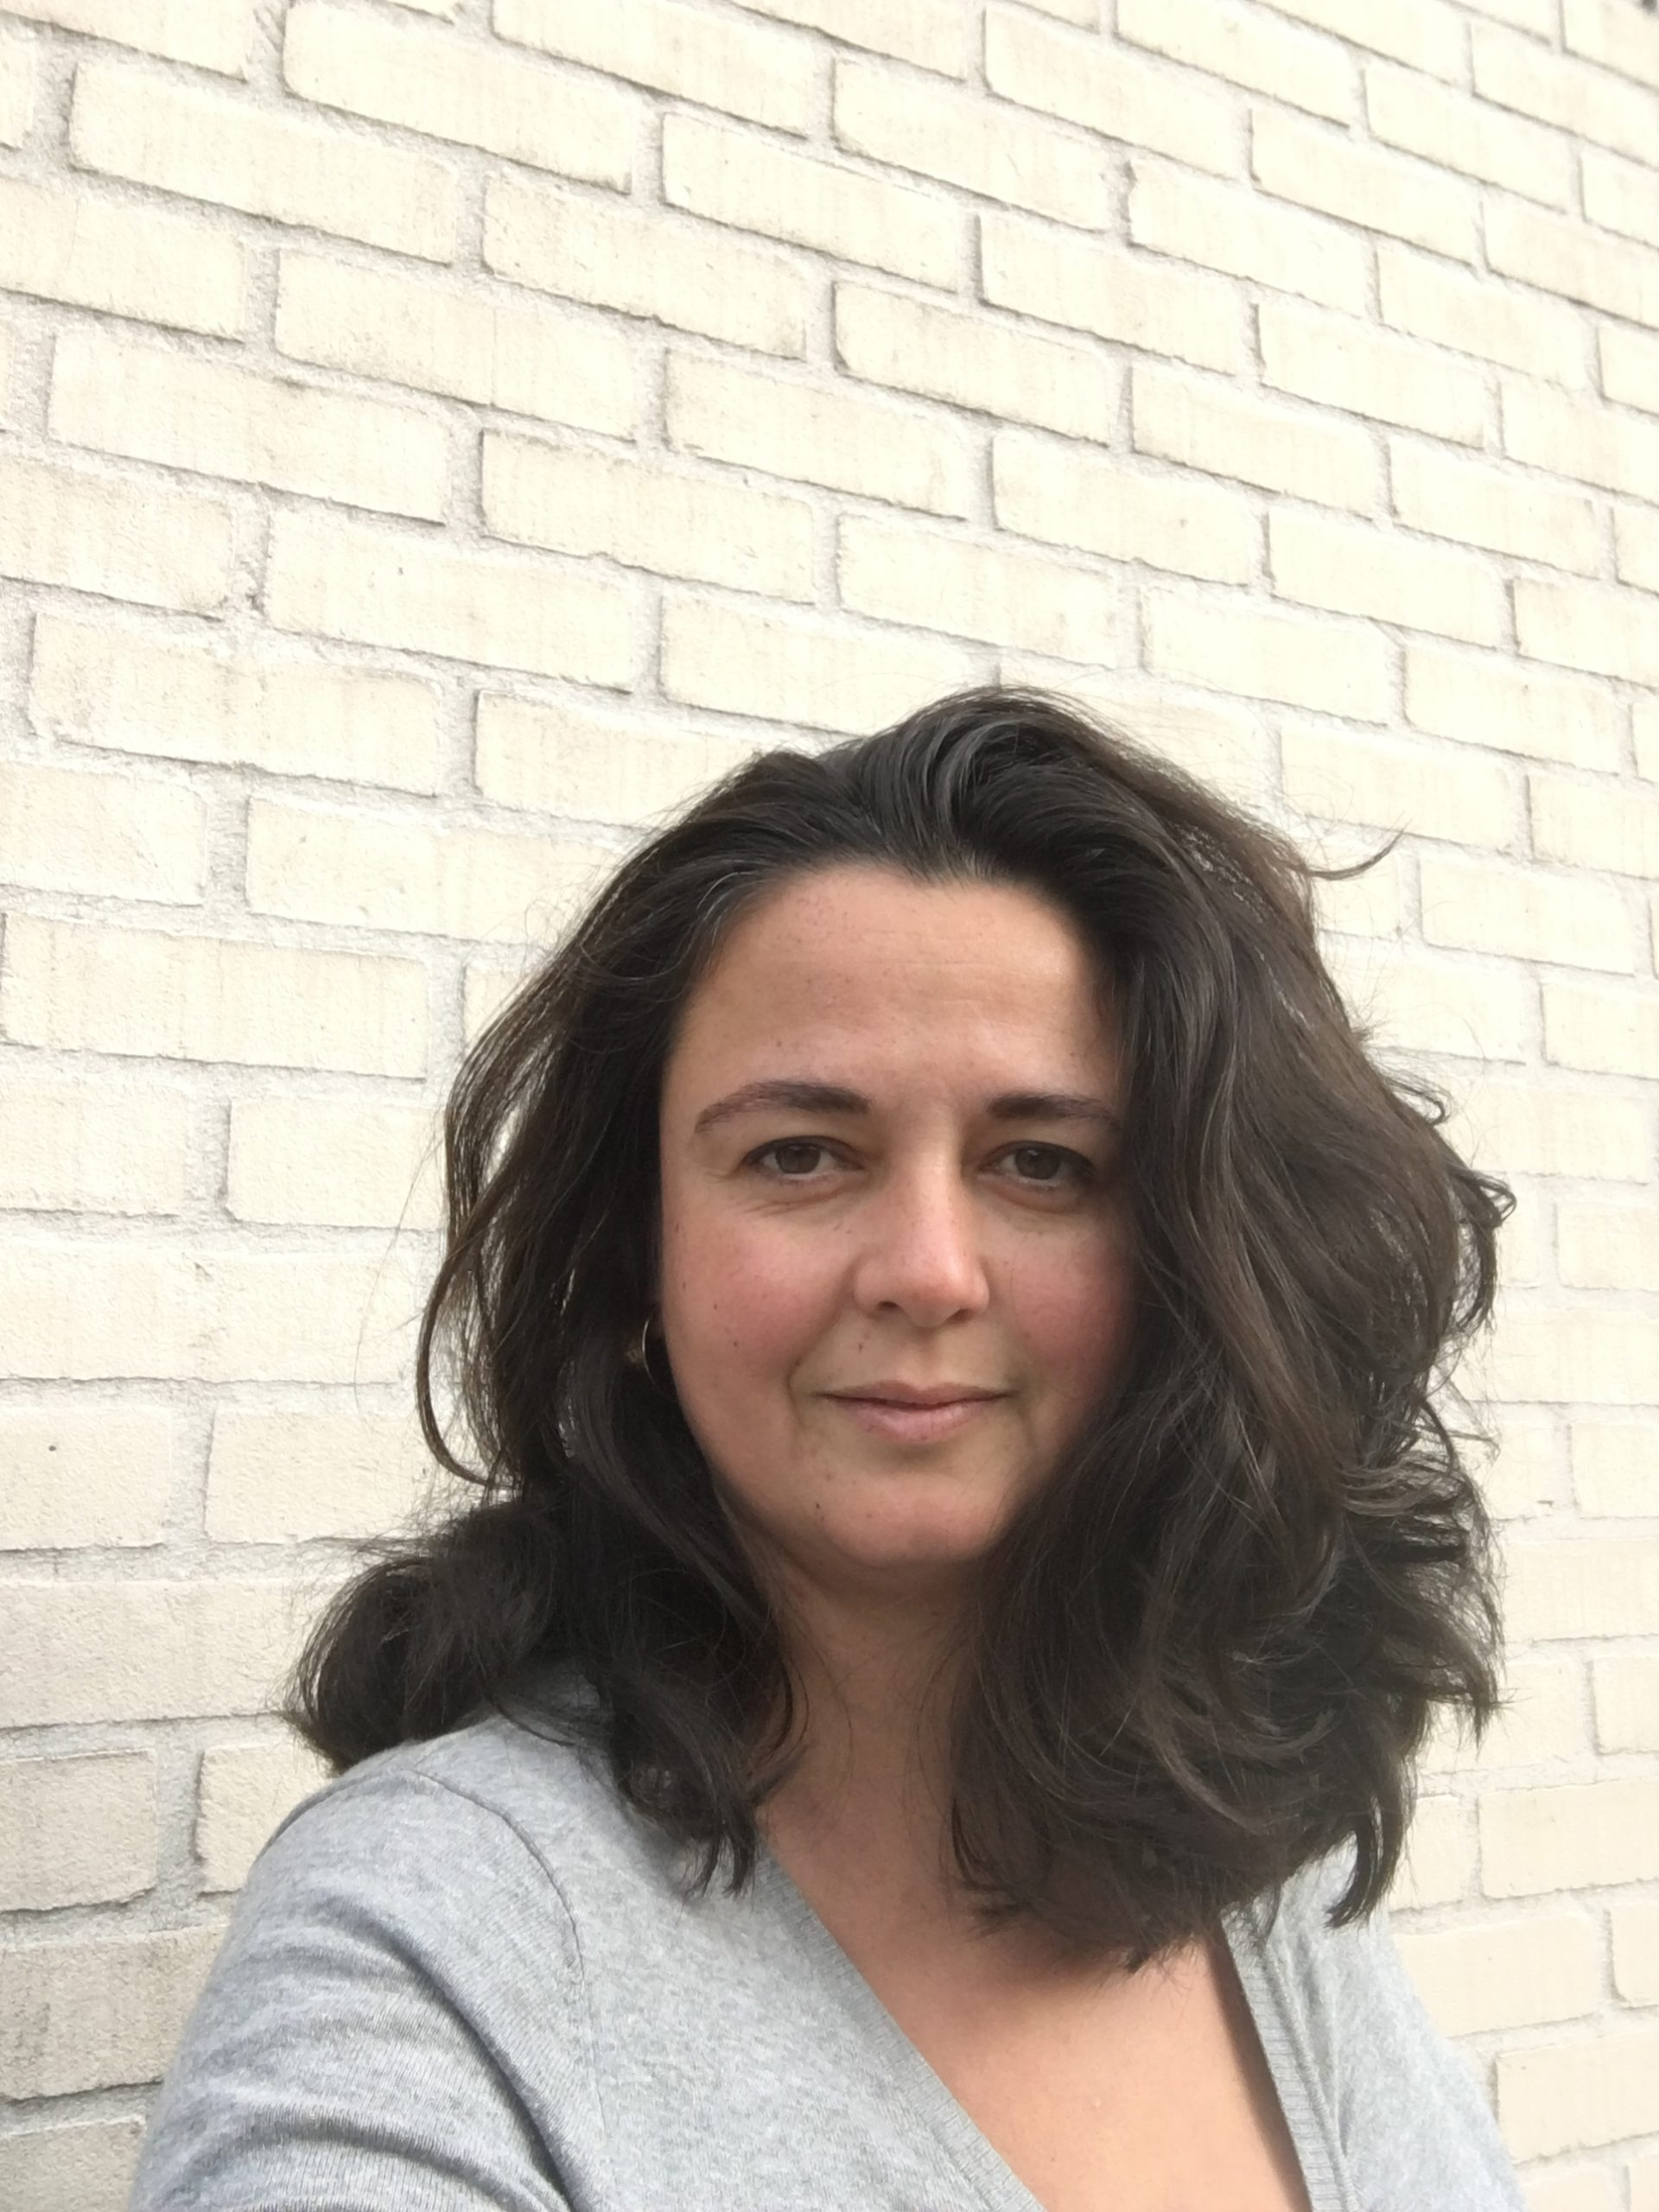 Esther Leydecker